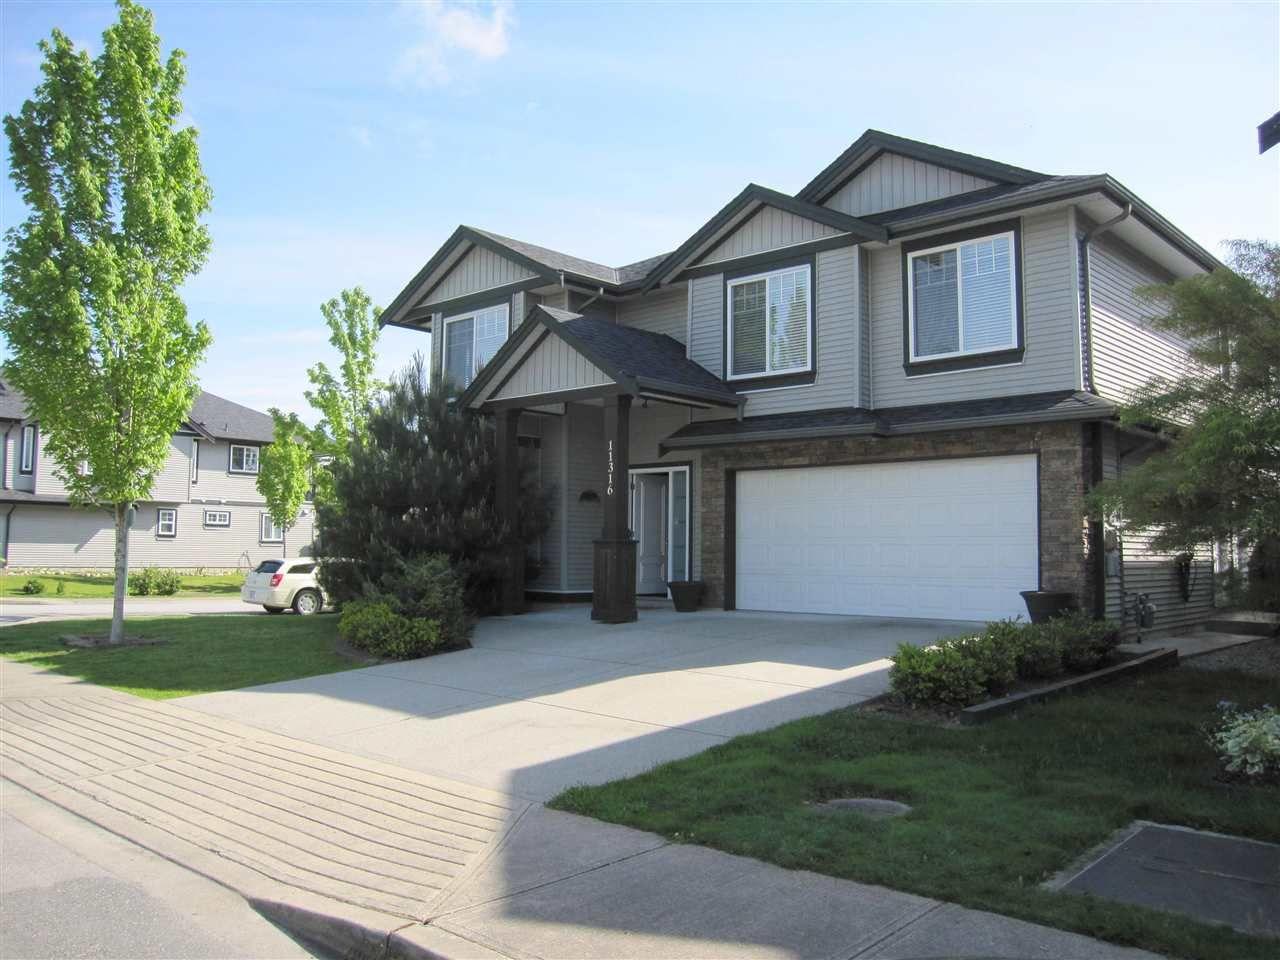 Main Photo: 11316 236 Street in Maple Ridge: Cottonwood MR House for sale : MLS®# R2062616